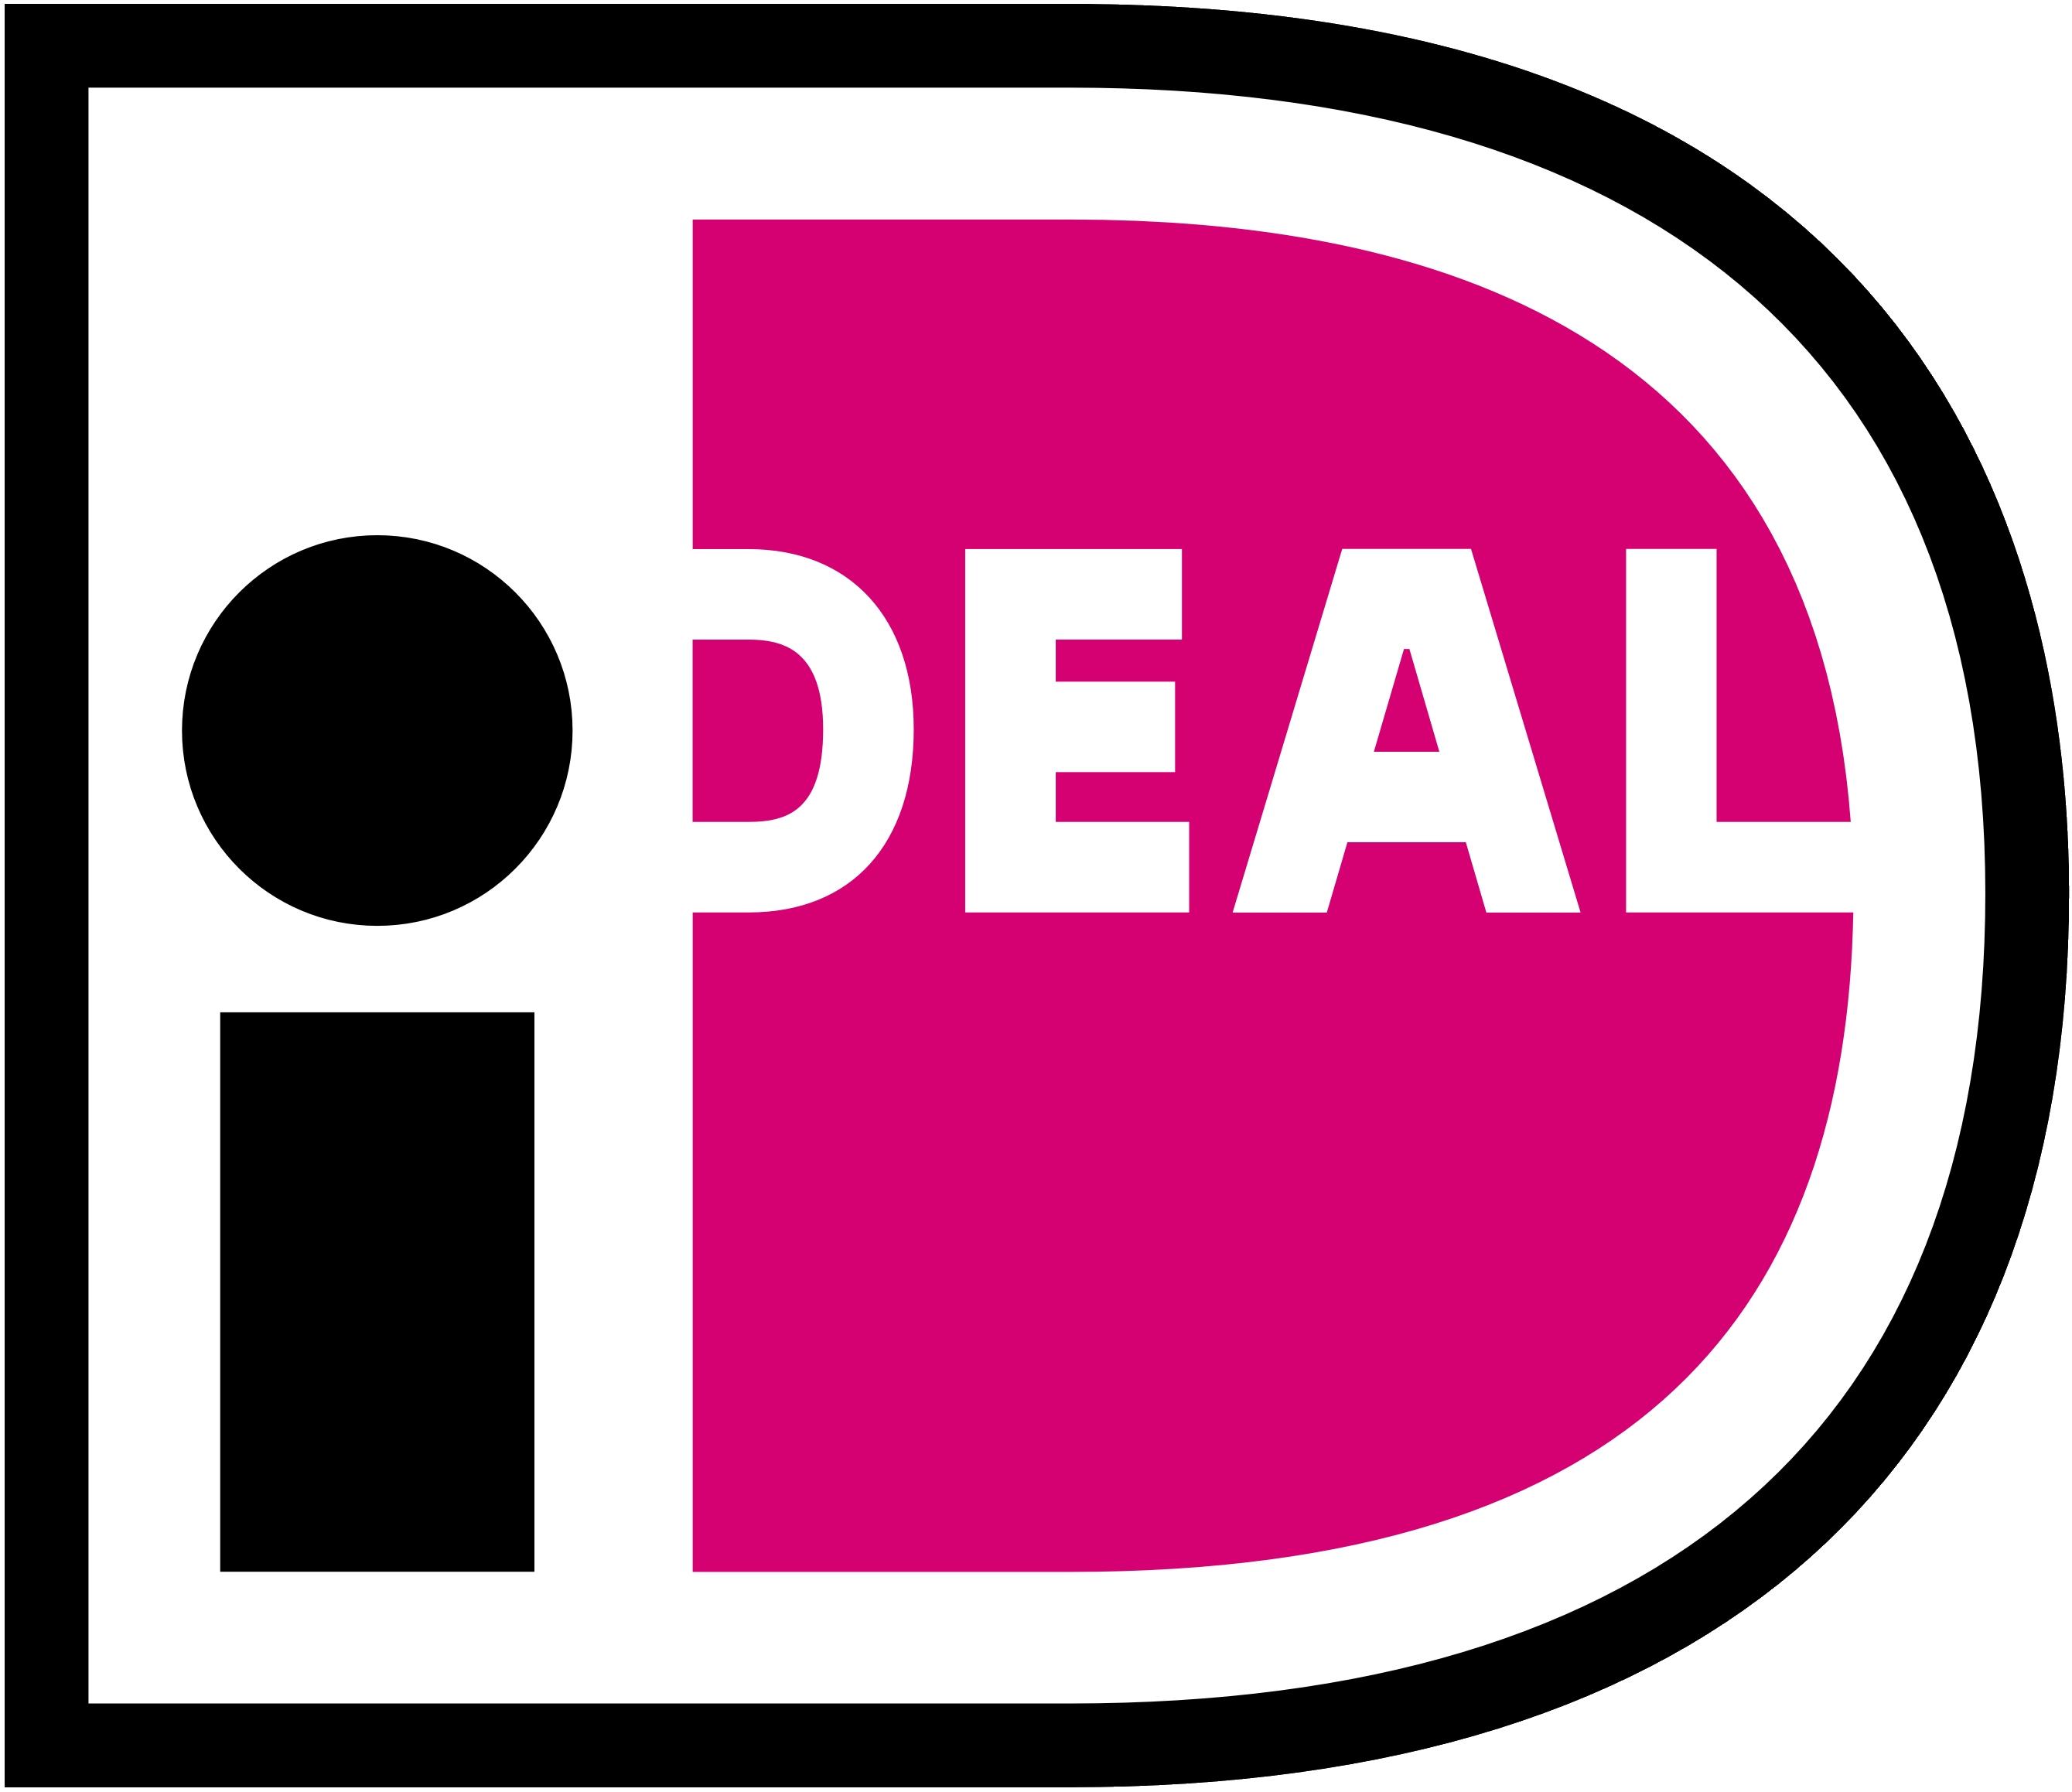 File:IDEAL Logo.png.